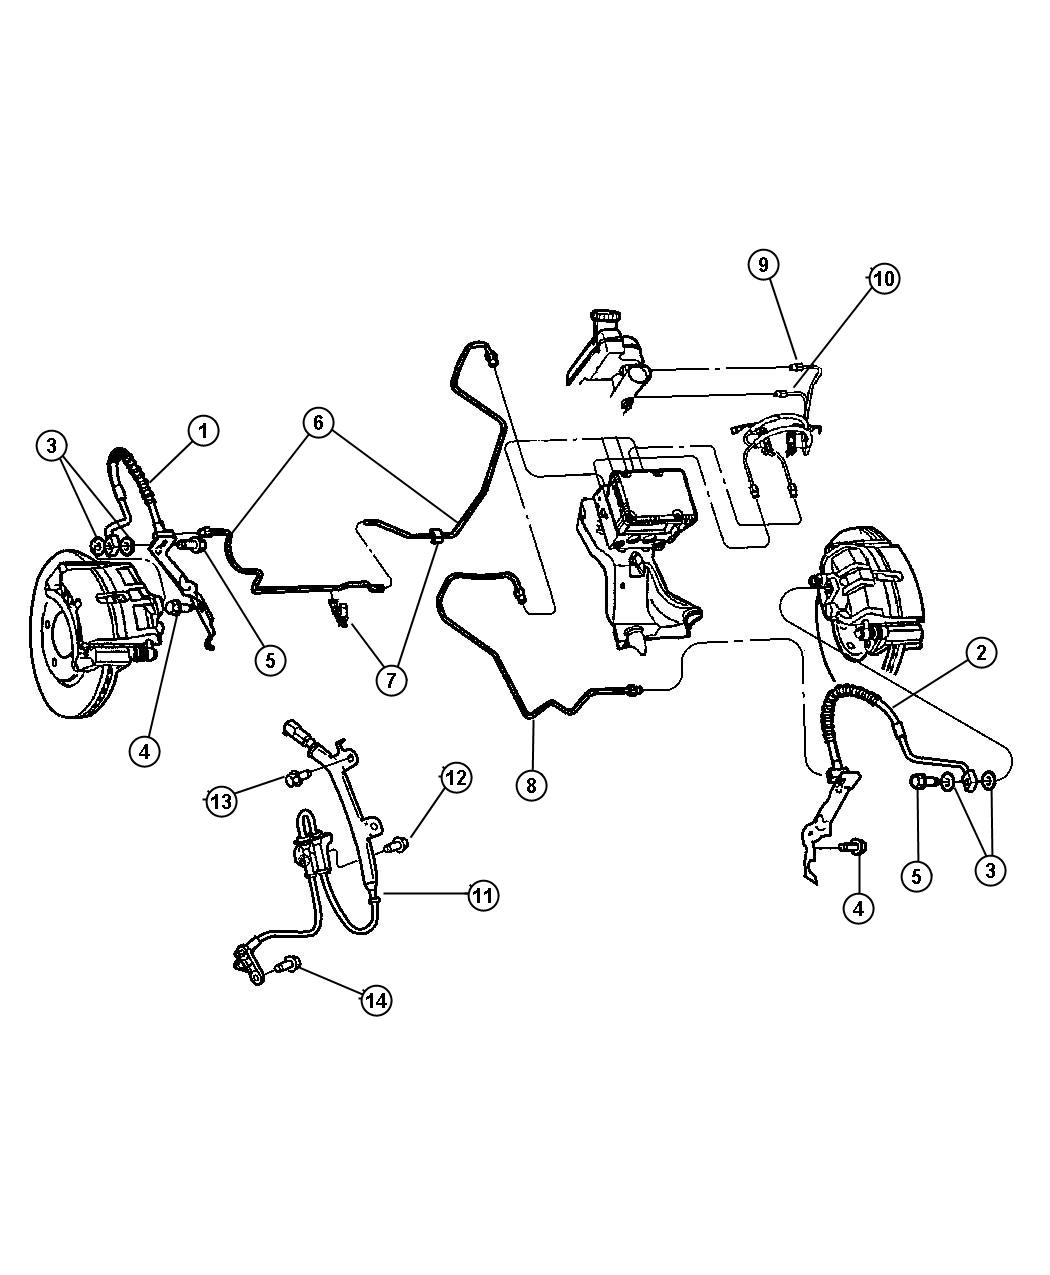 Pt Cruiser Parts Accessories